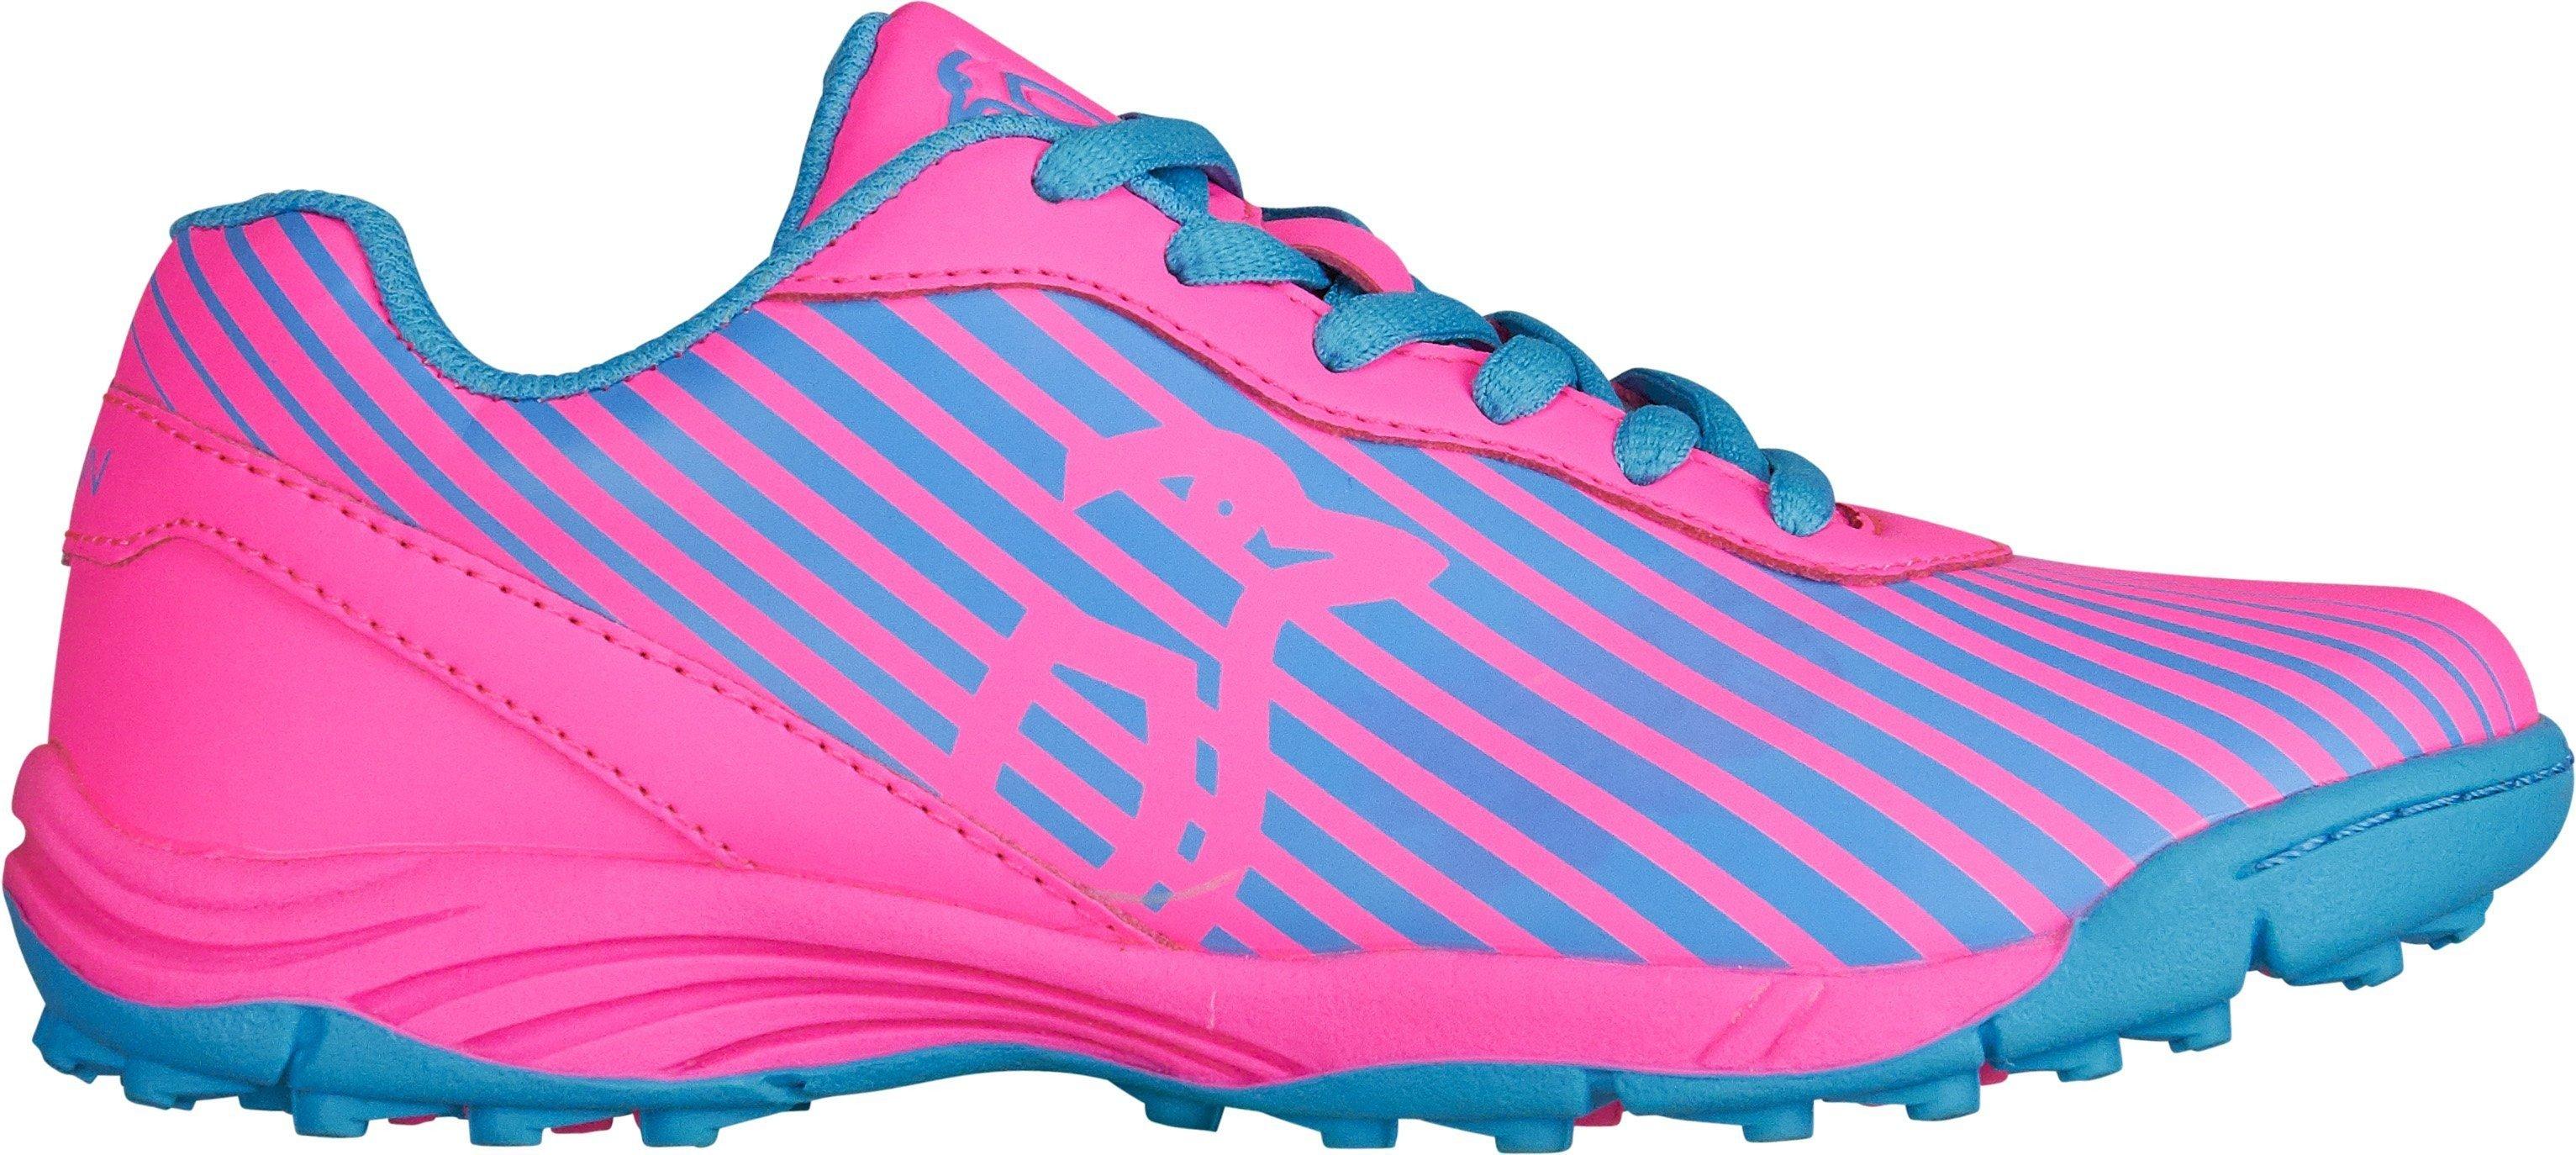 2017/18 Kookaburra Neon Sherbert Pink/Ceramic Blue Hockey Shoes